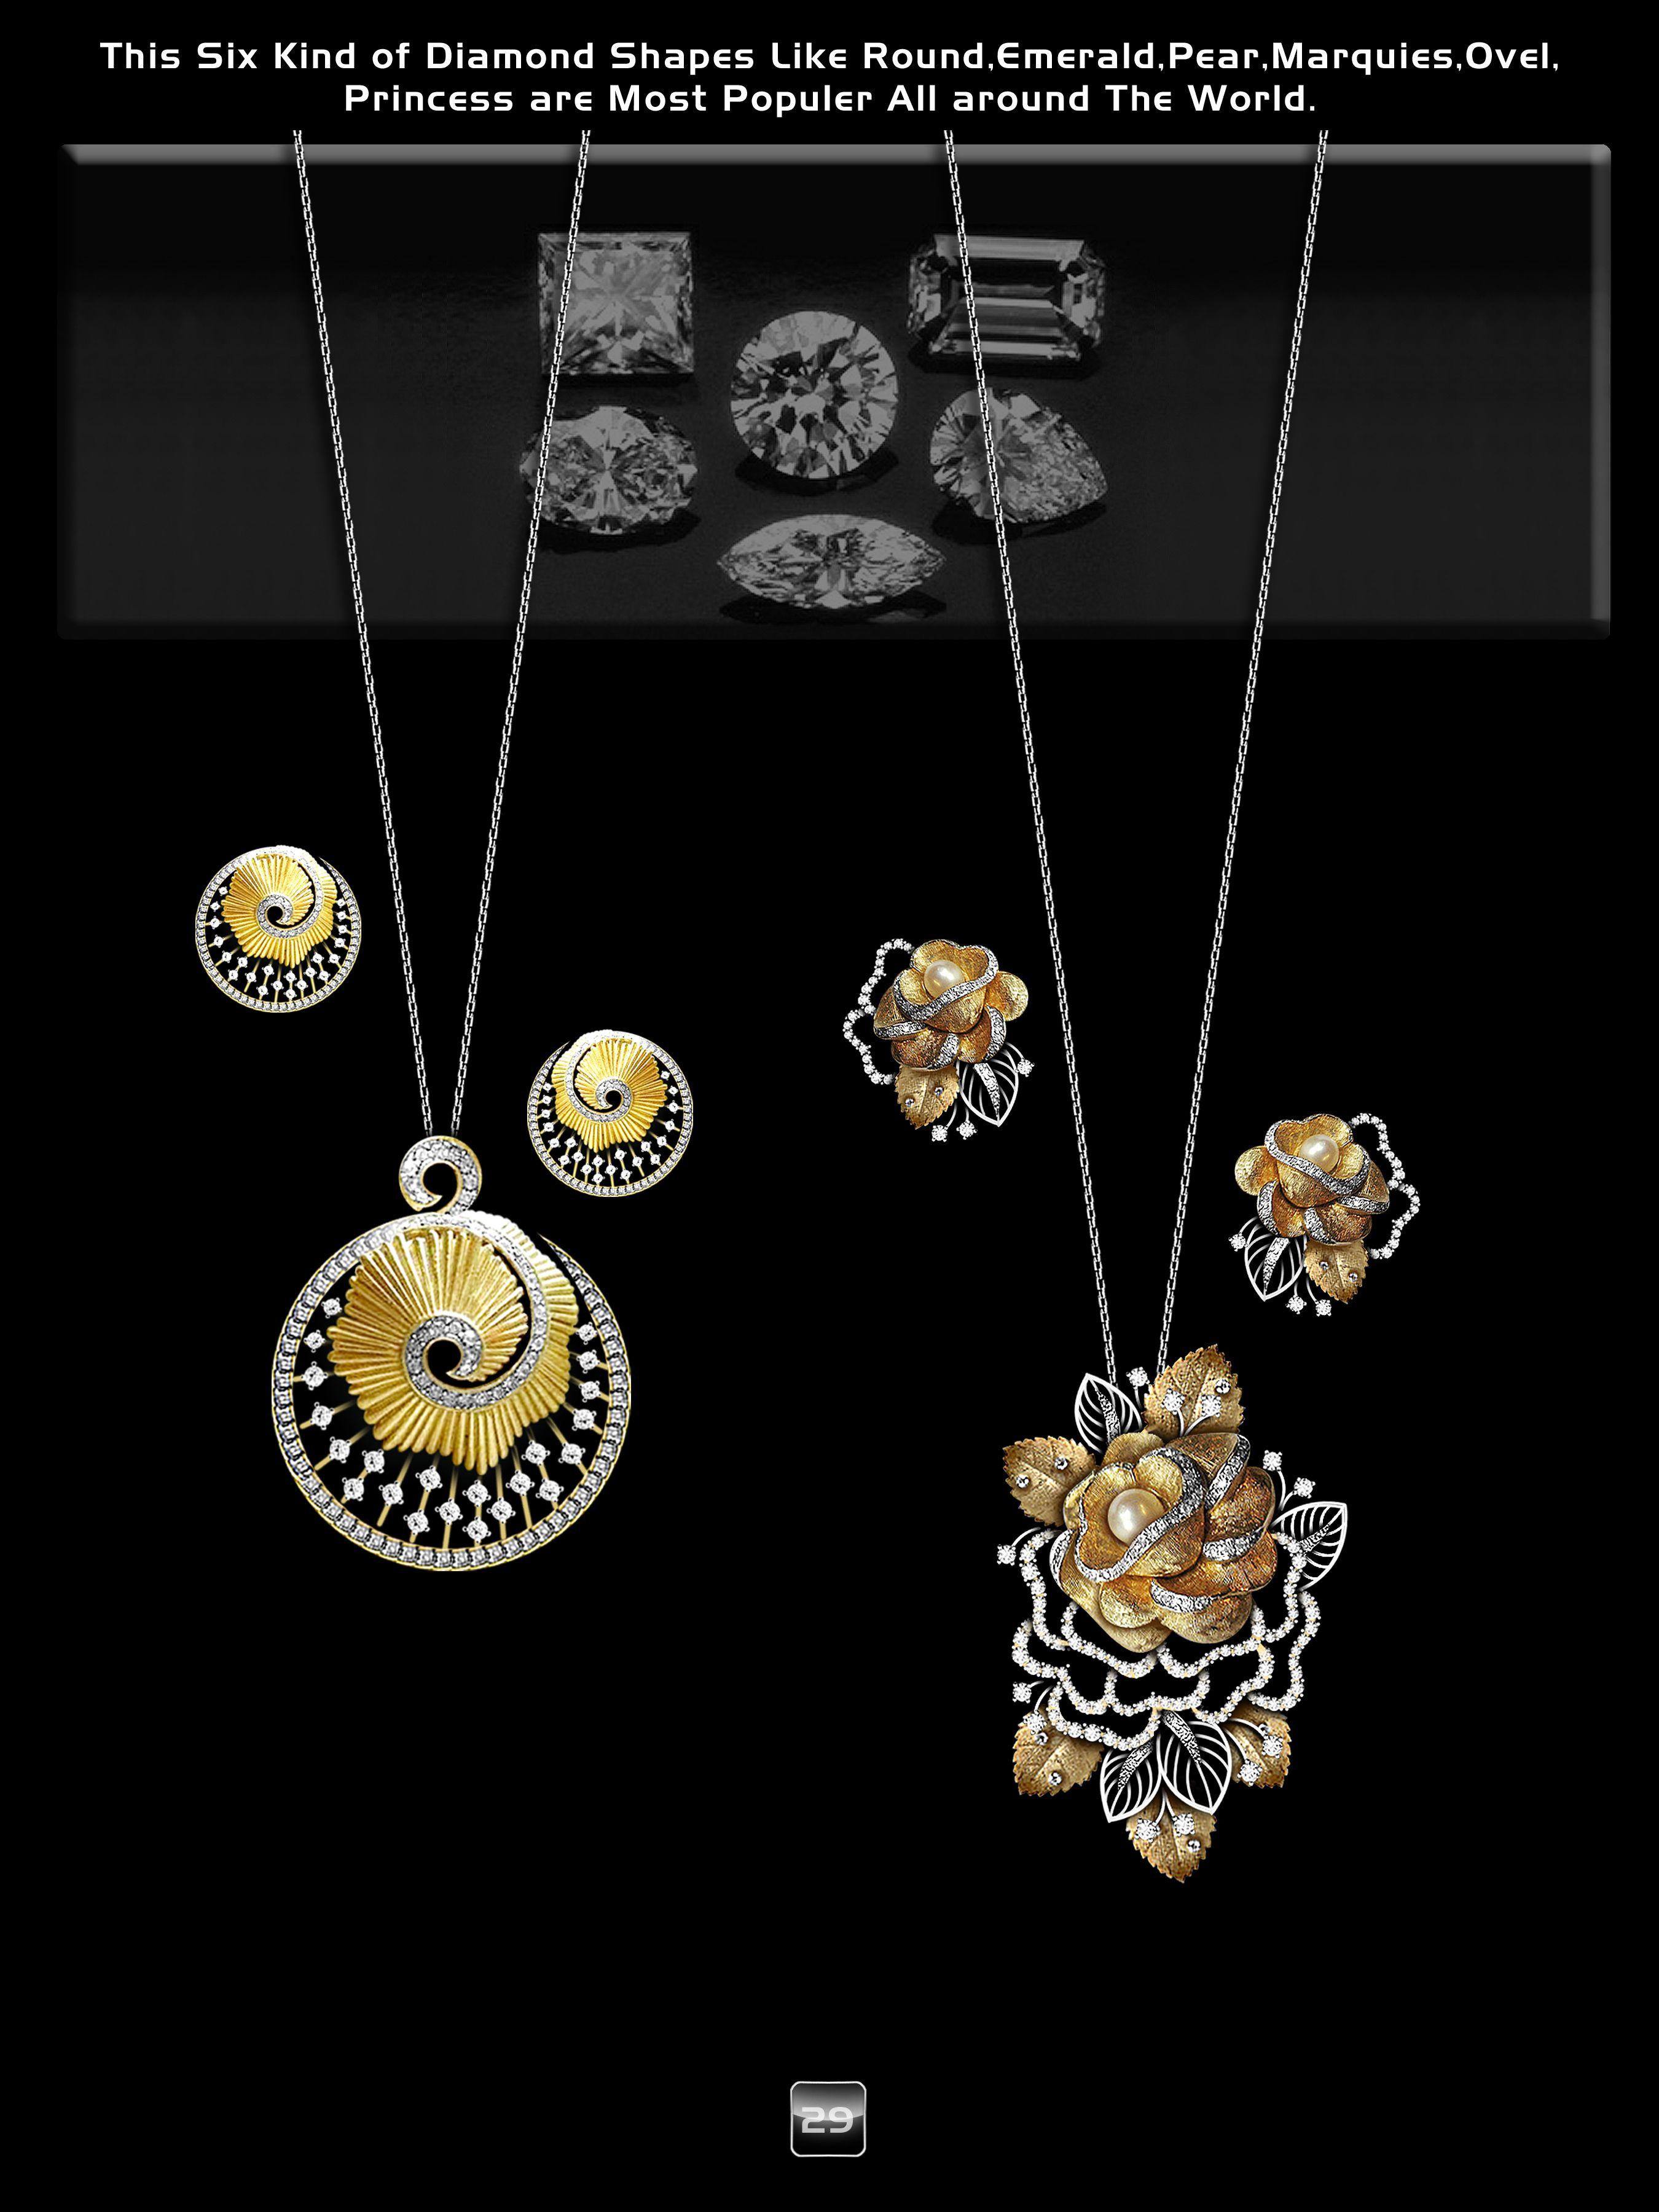 Pendant set joies pinterest pendant set pendants and